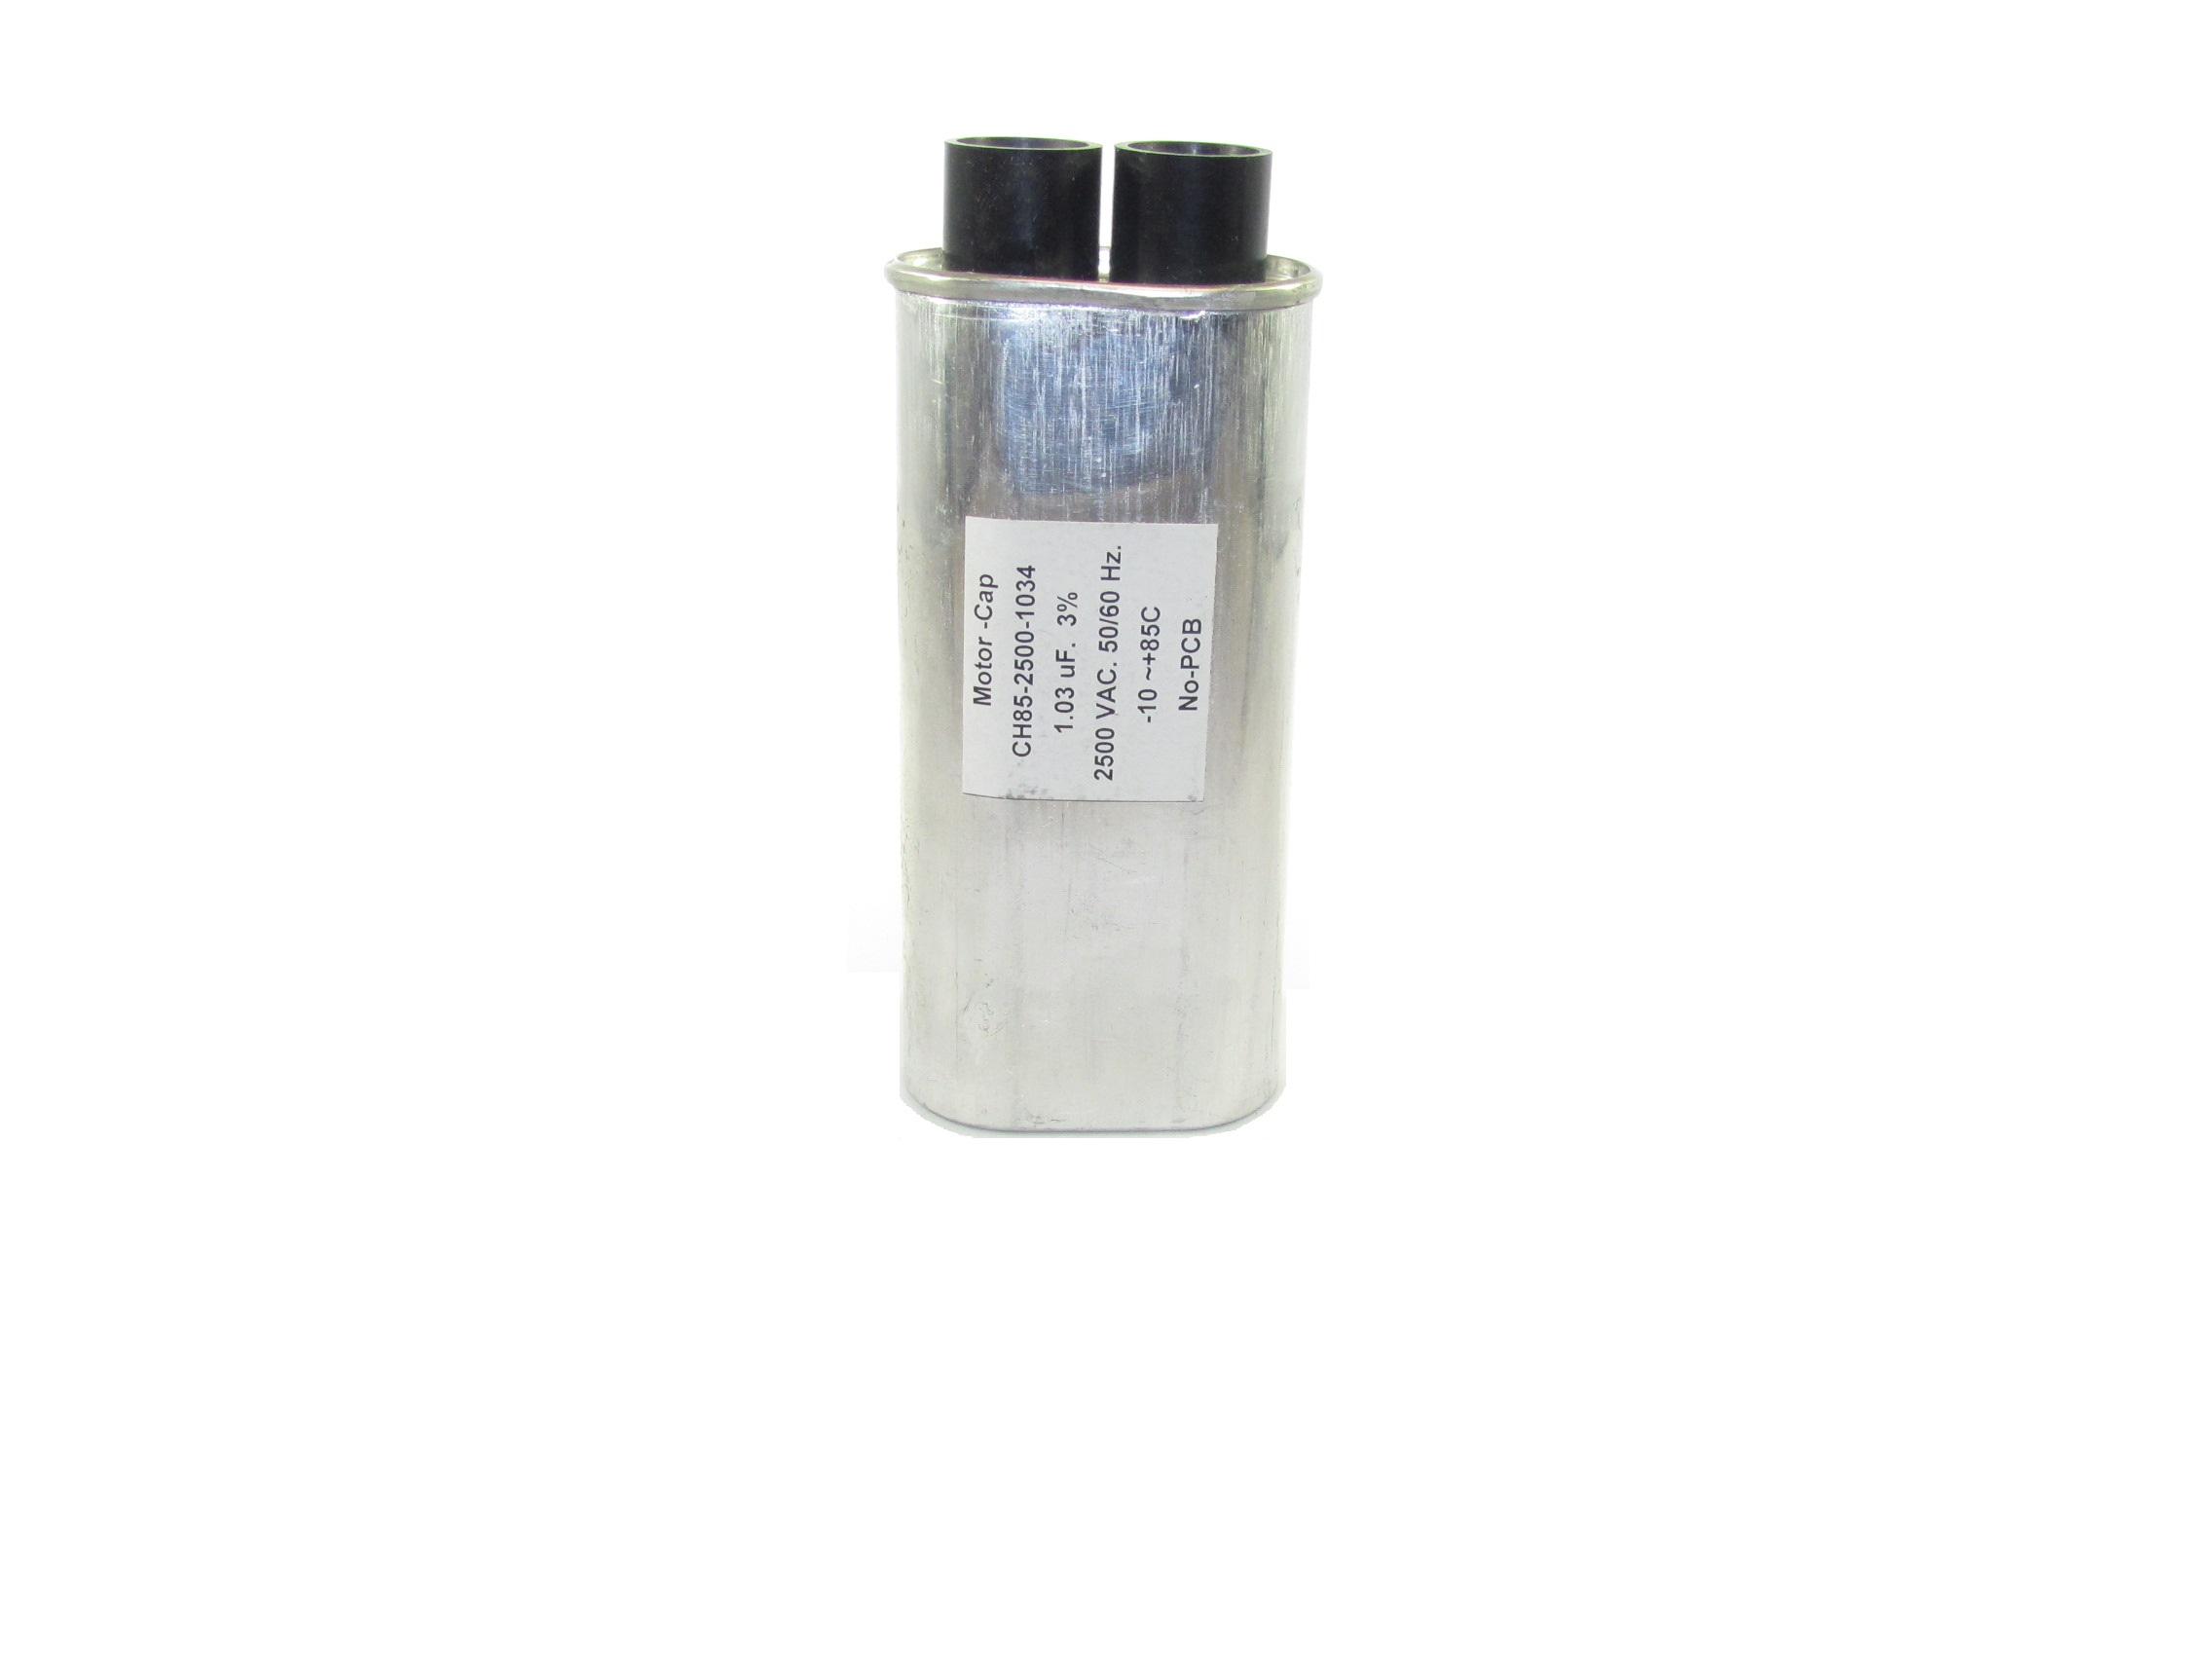 CH85-2500-1034-M1 1 03 uF 2500 VAC Capacitor